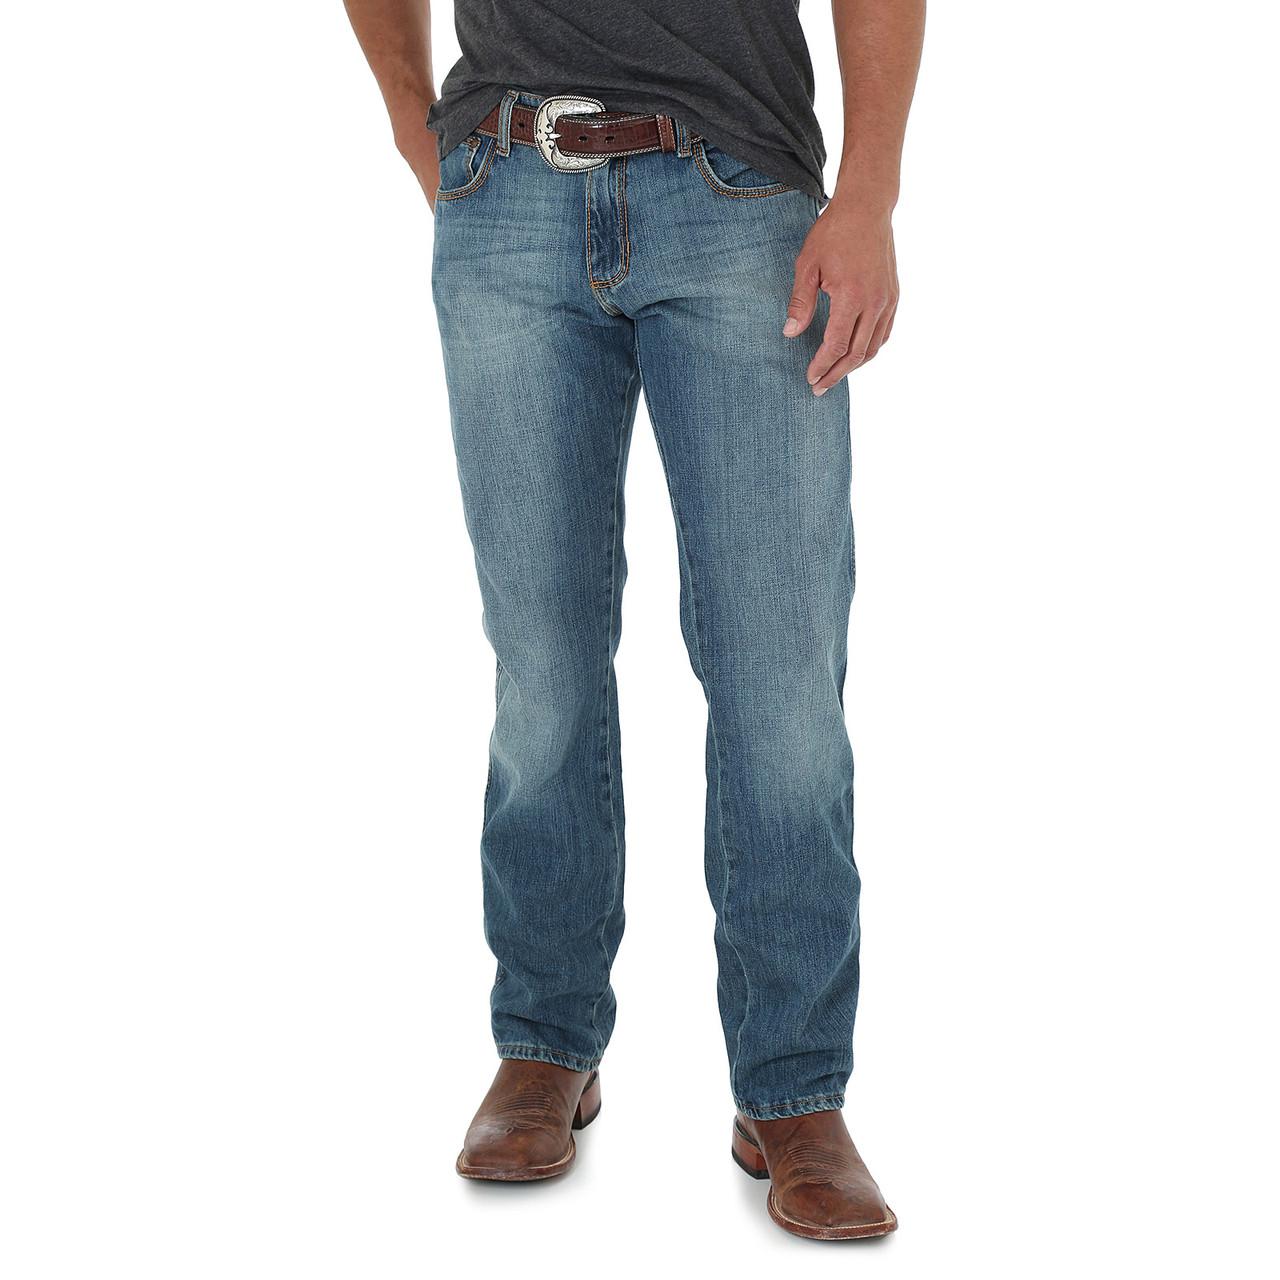 Джинсы Wrangler Retro Slim Fit Straight Leg, Rocky Top, 40W34L, 88MWZRT